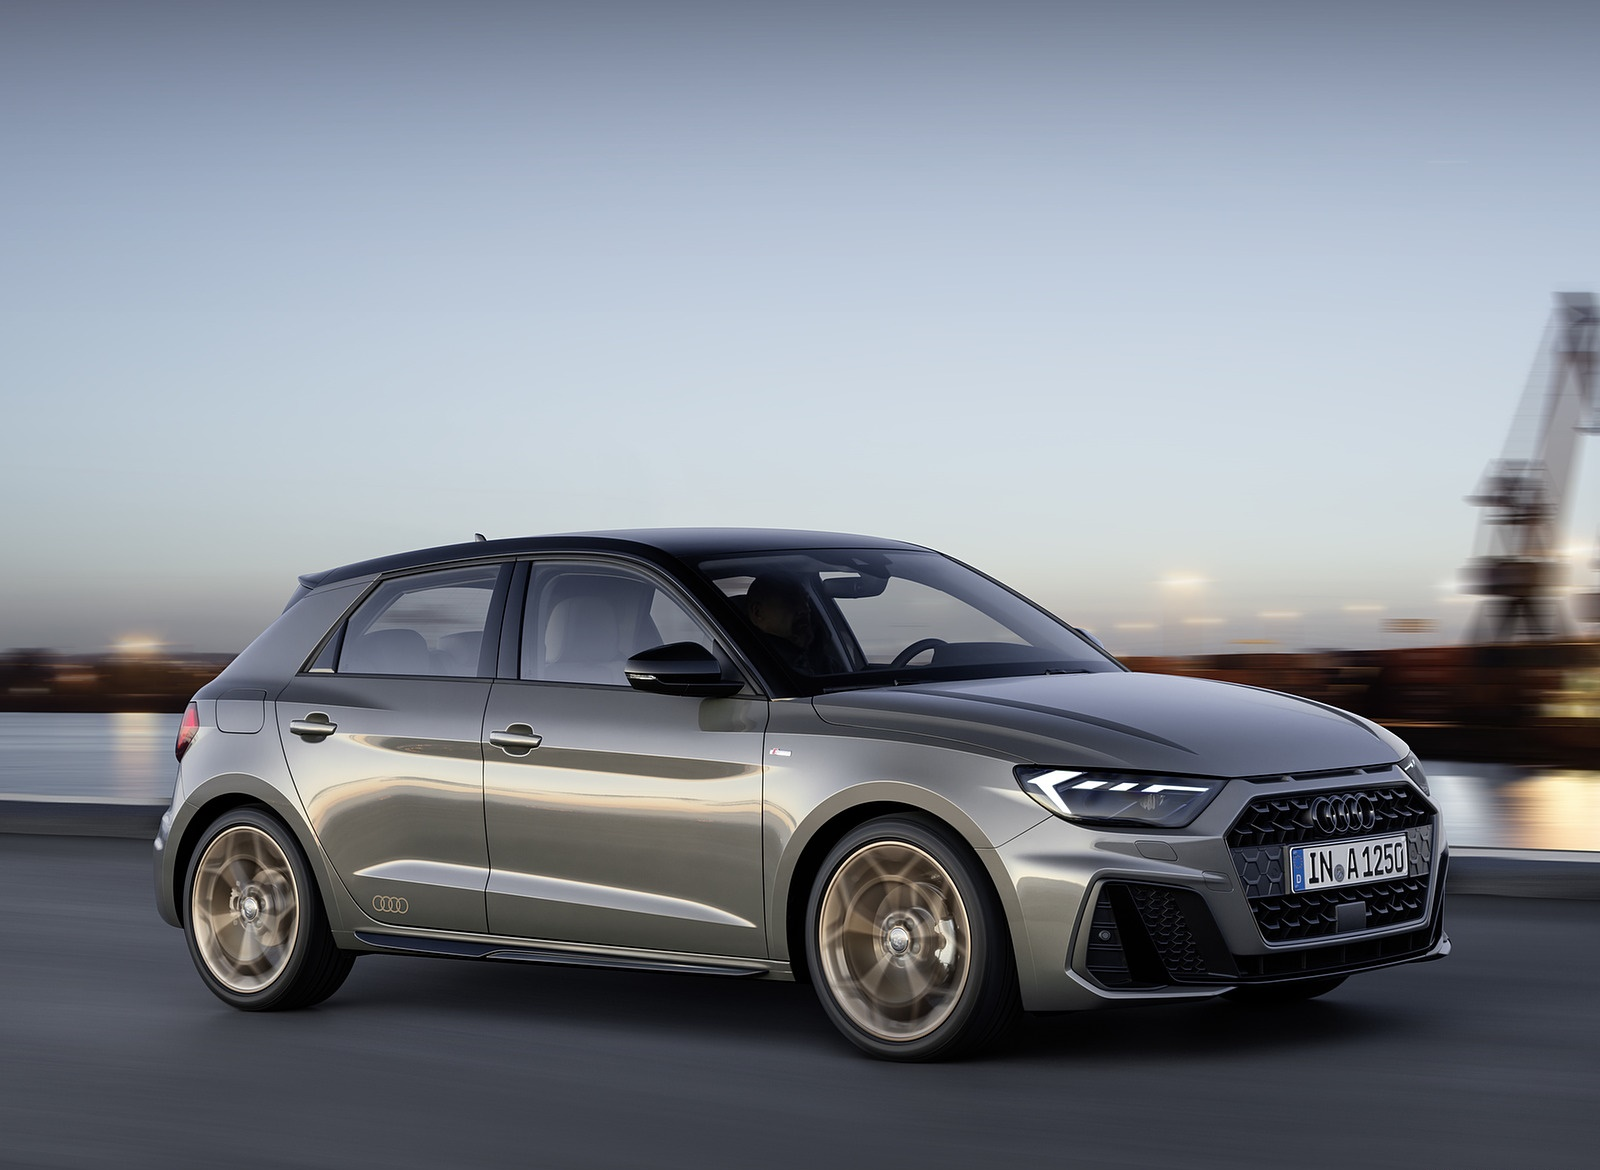 2019 Audi A1 Sportback (Color: Chronos Grey) Front Three-Quarter Wallpapers (5)